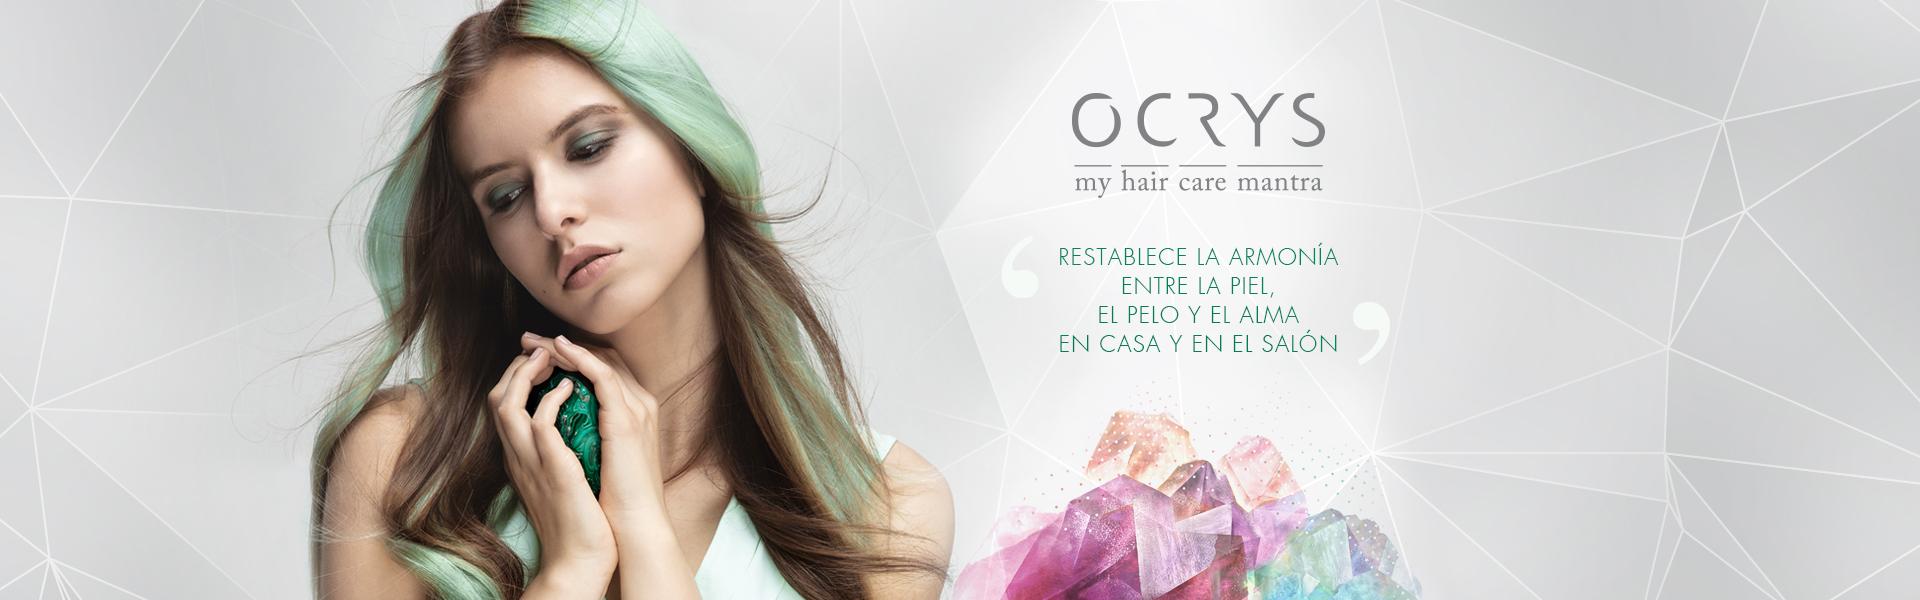 banner_centrali_OCRYS_FR